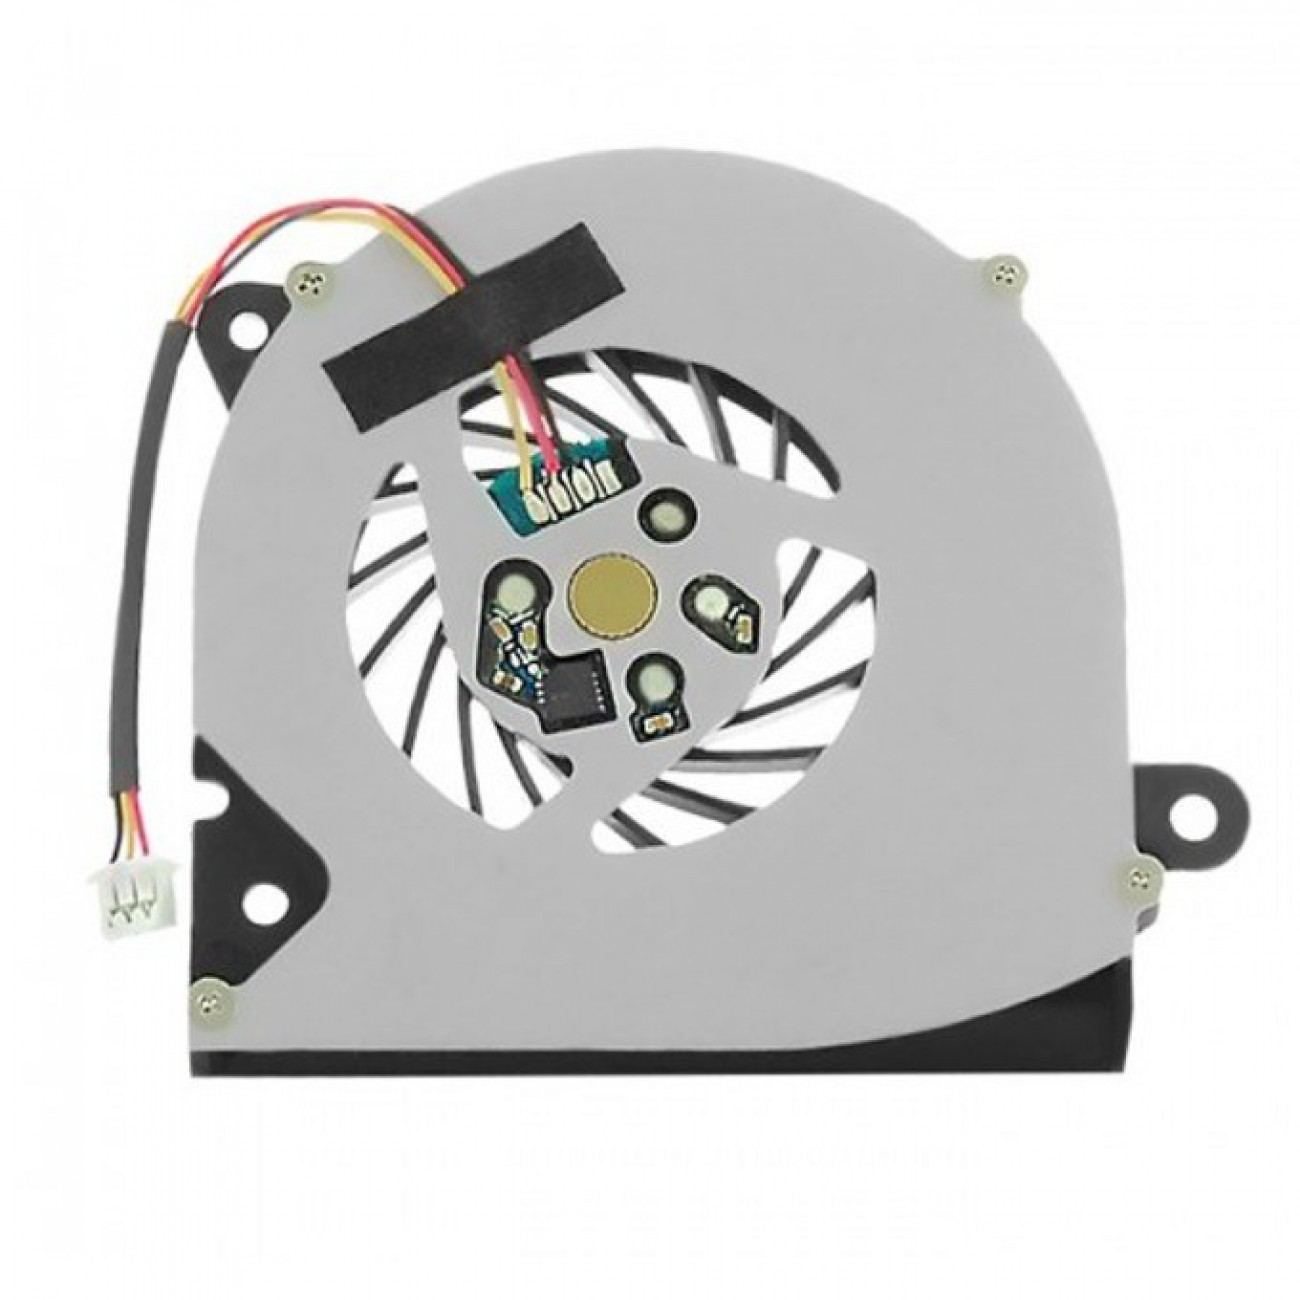 Вентилатор за лаптоп, DELL Inspiron 1110 11Z в Резервни части -  | Alleop